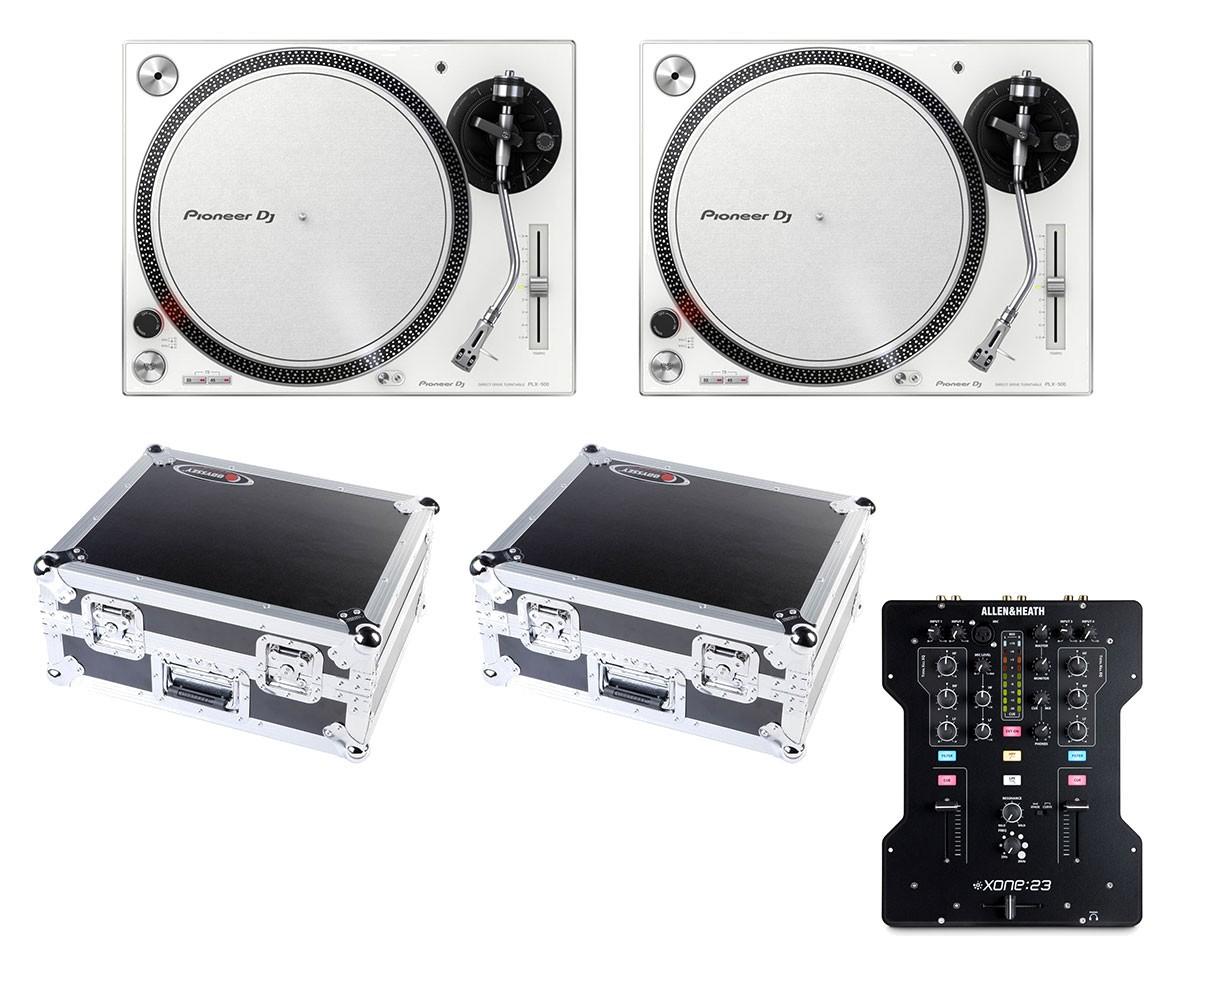 2x Pioneer PLX-500 (White) + Allen & Heath  Xone:23 + 2x Odyssey Cases